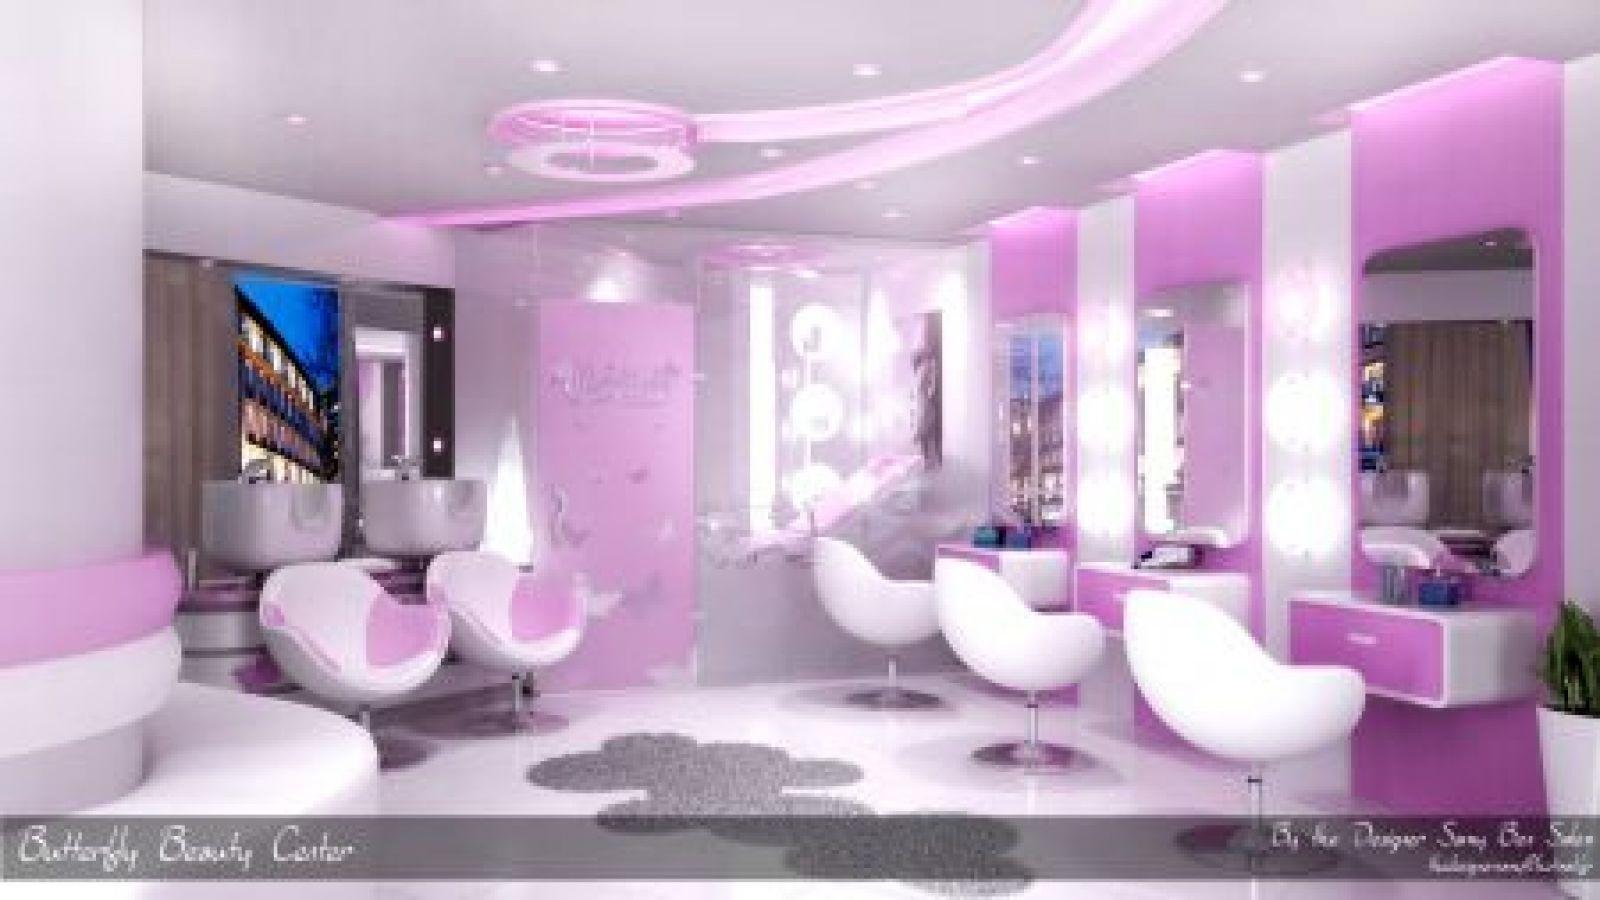 Butterfly Beauty Center